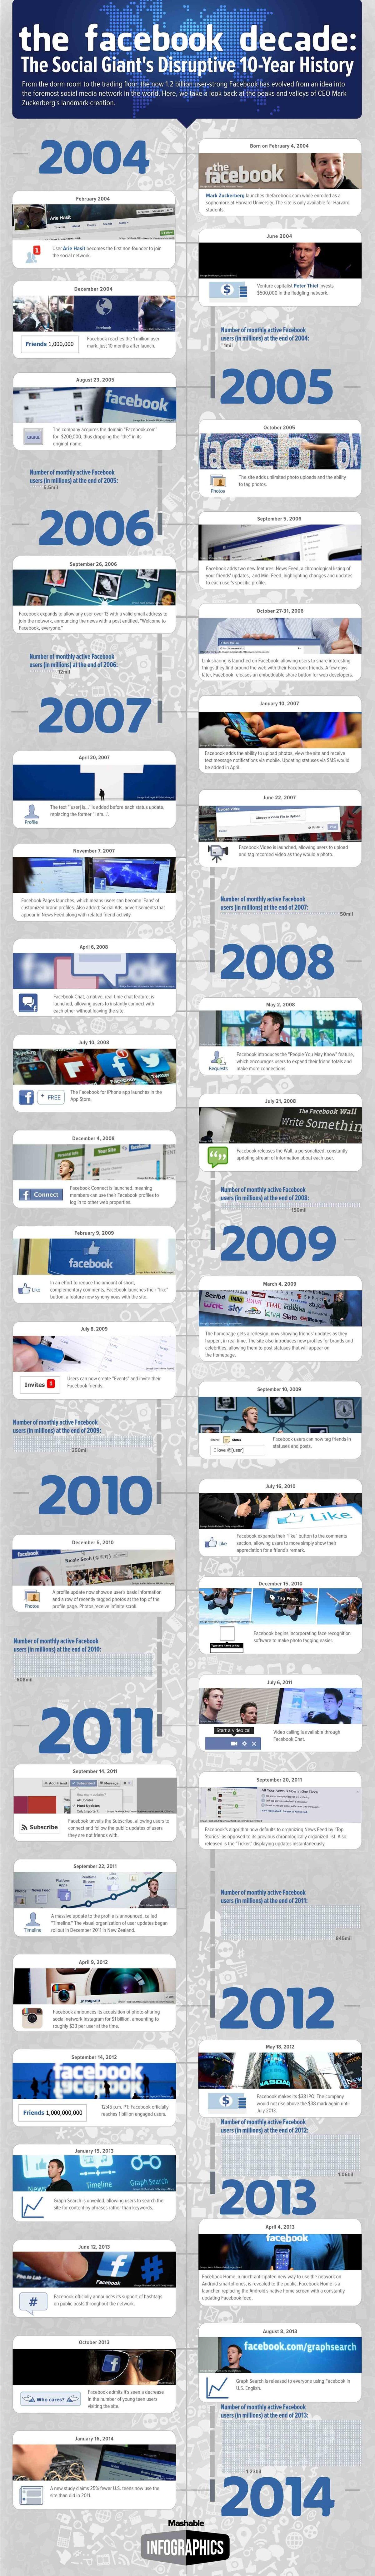 Histoire de Facebook - 10 ans